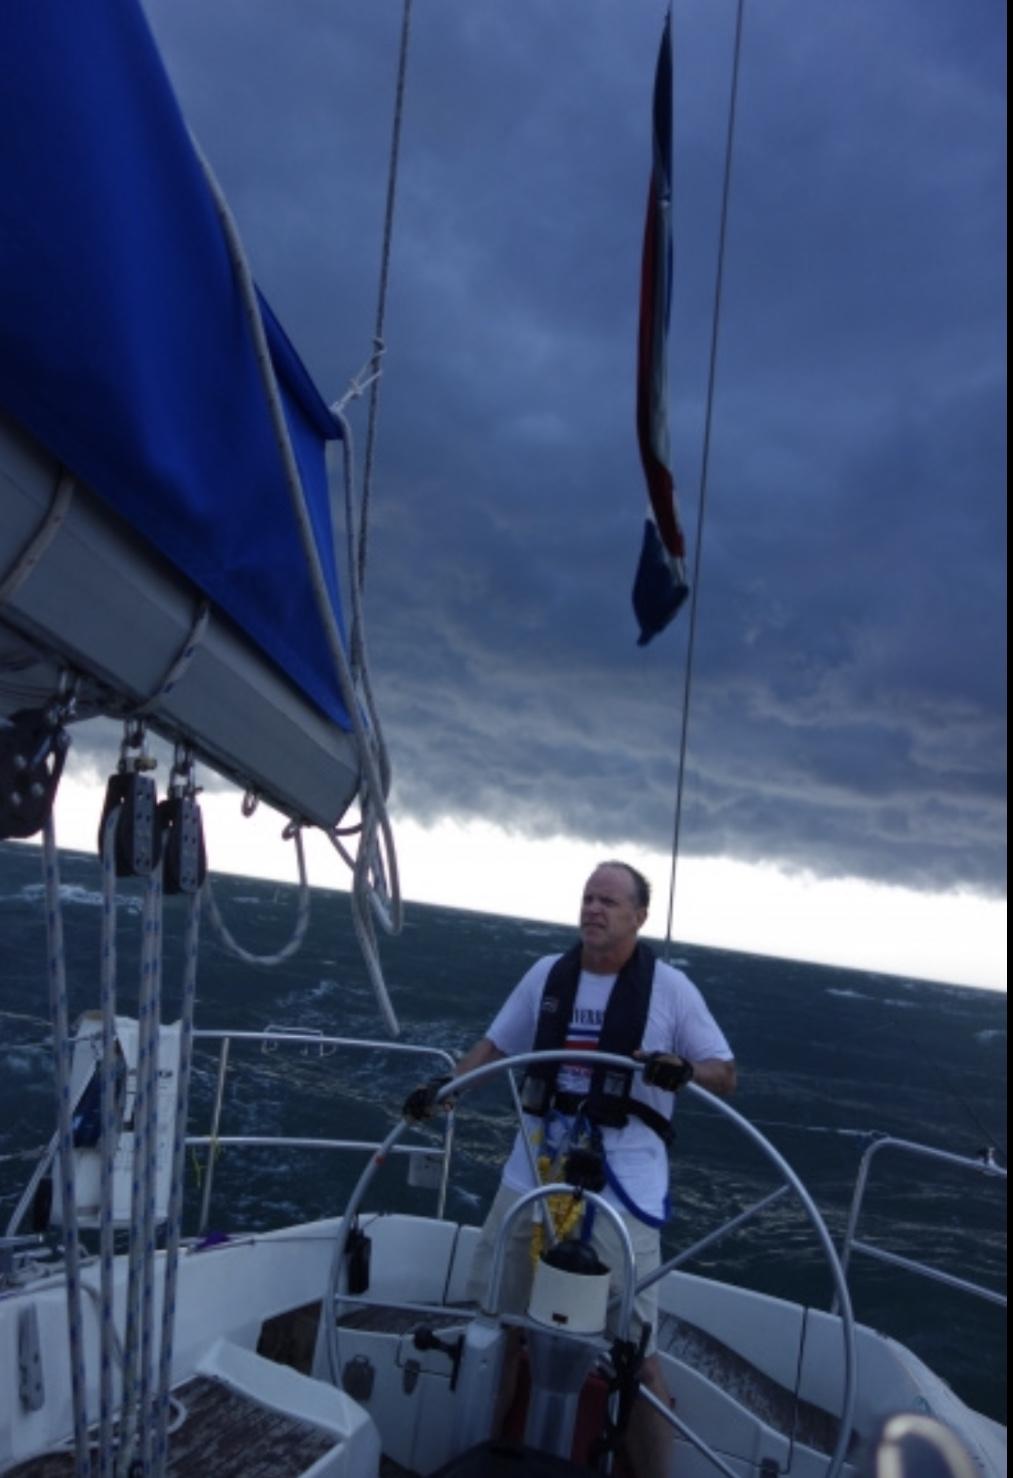 Captain Tim has weathered similar storms.